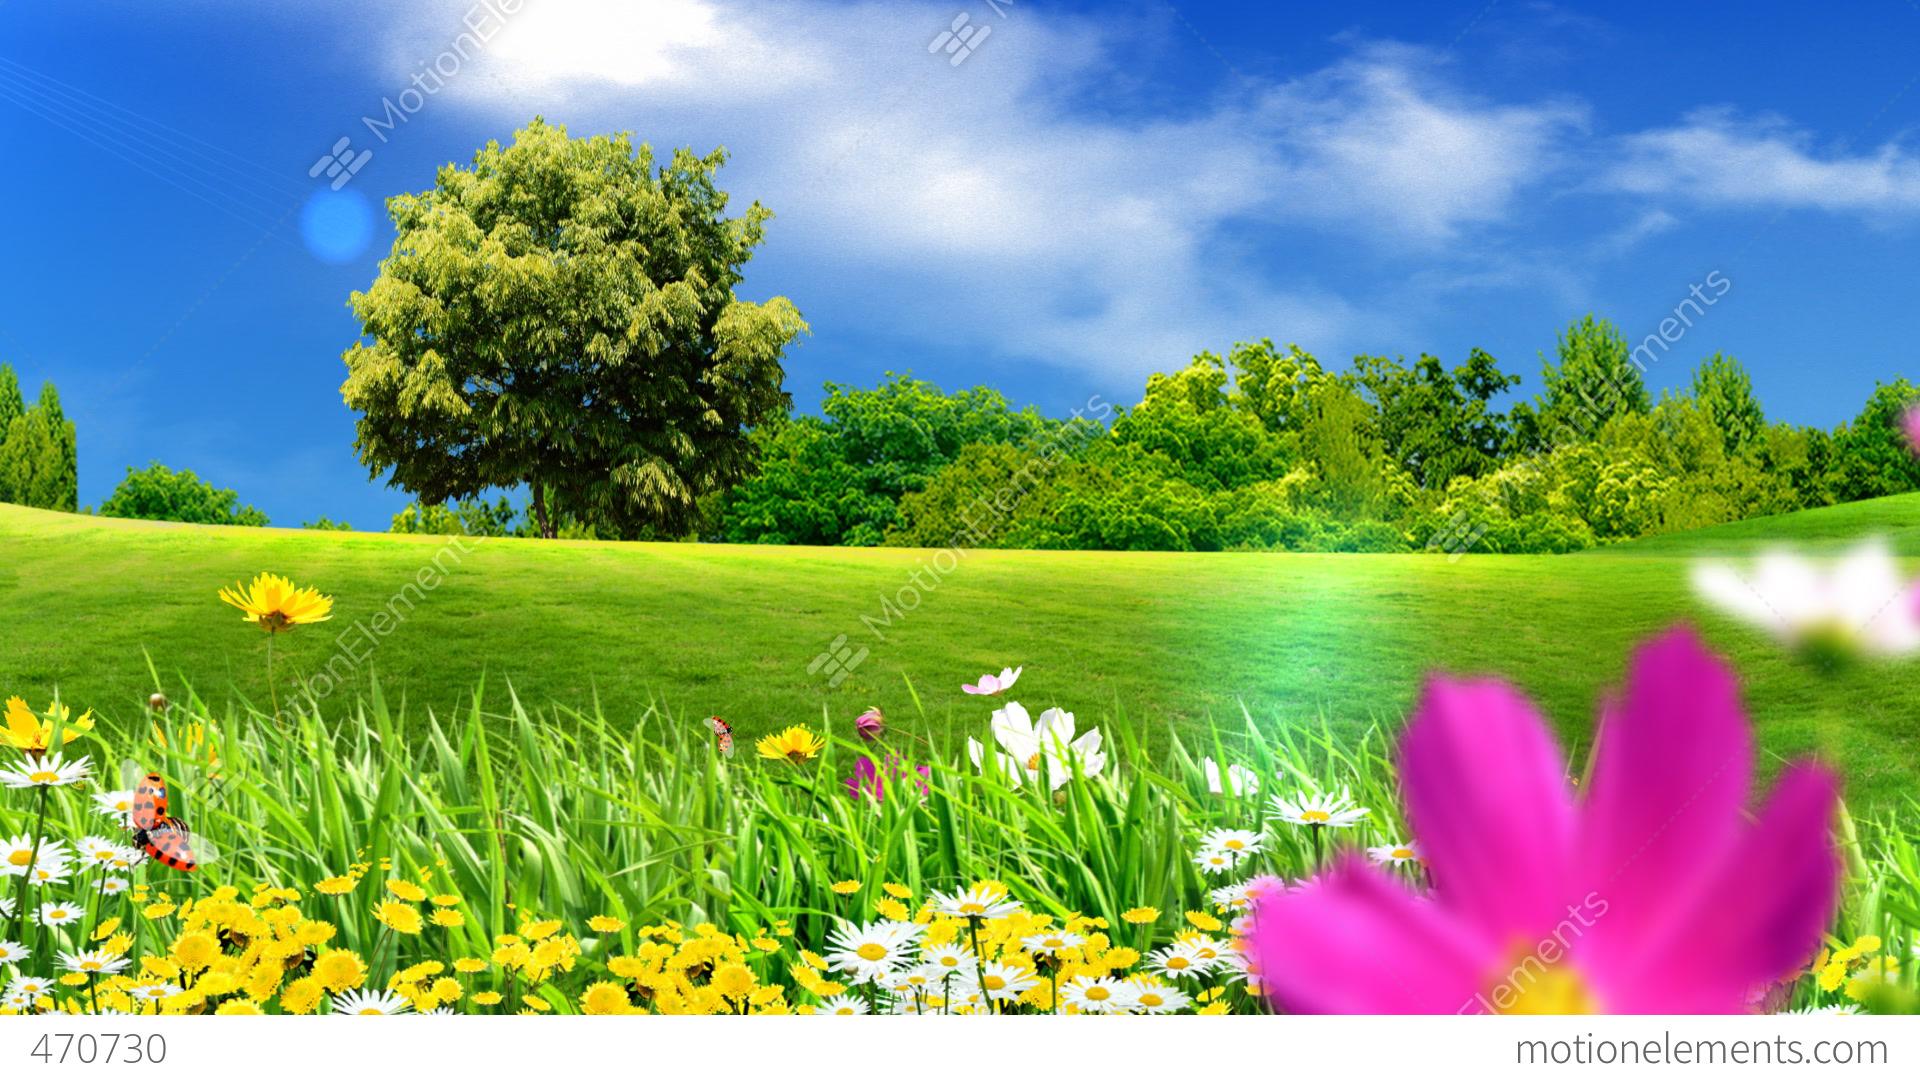 Dew Drops on Green Grass Morning Wallpaper For Desktop